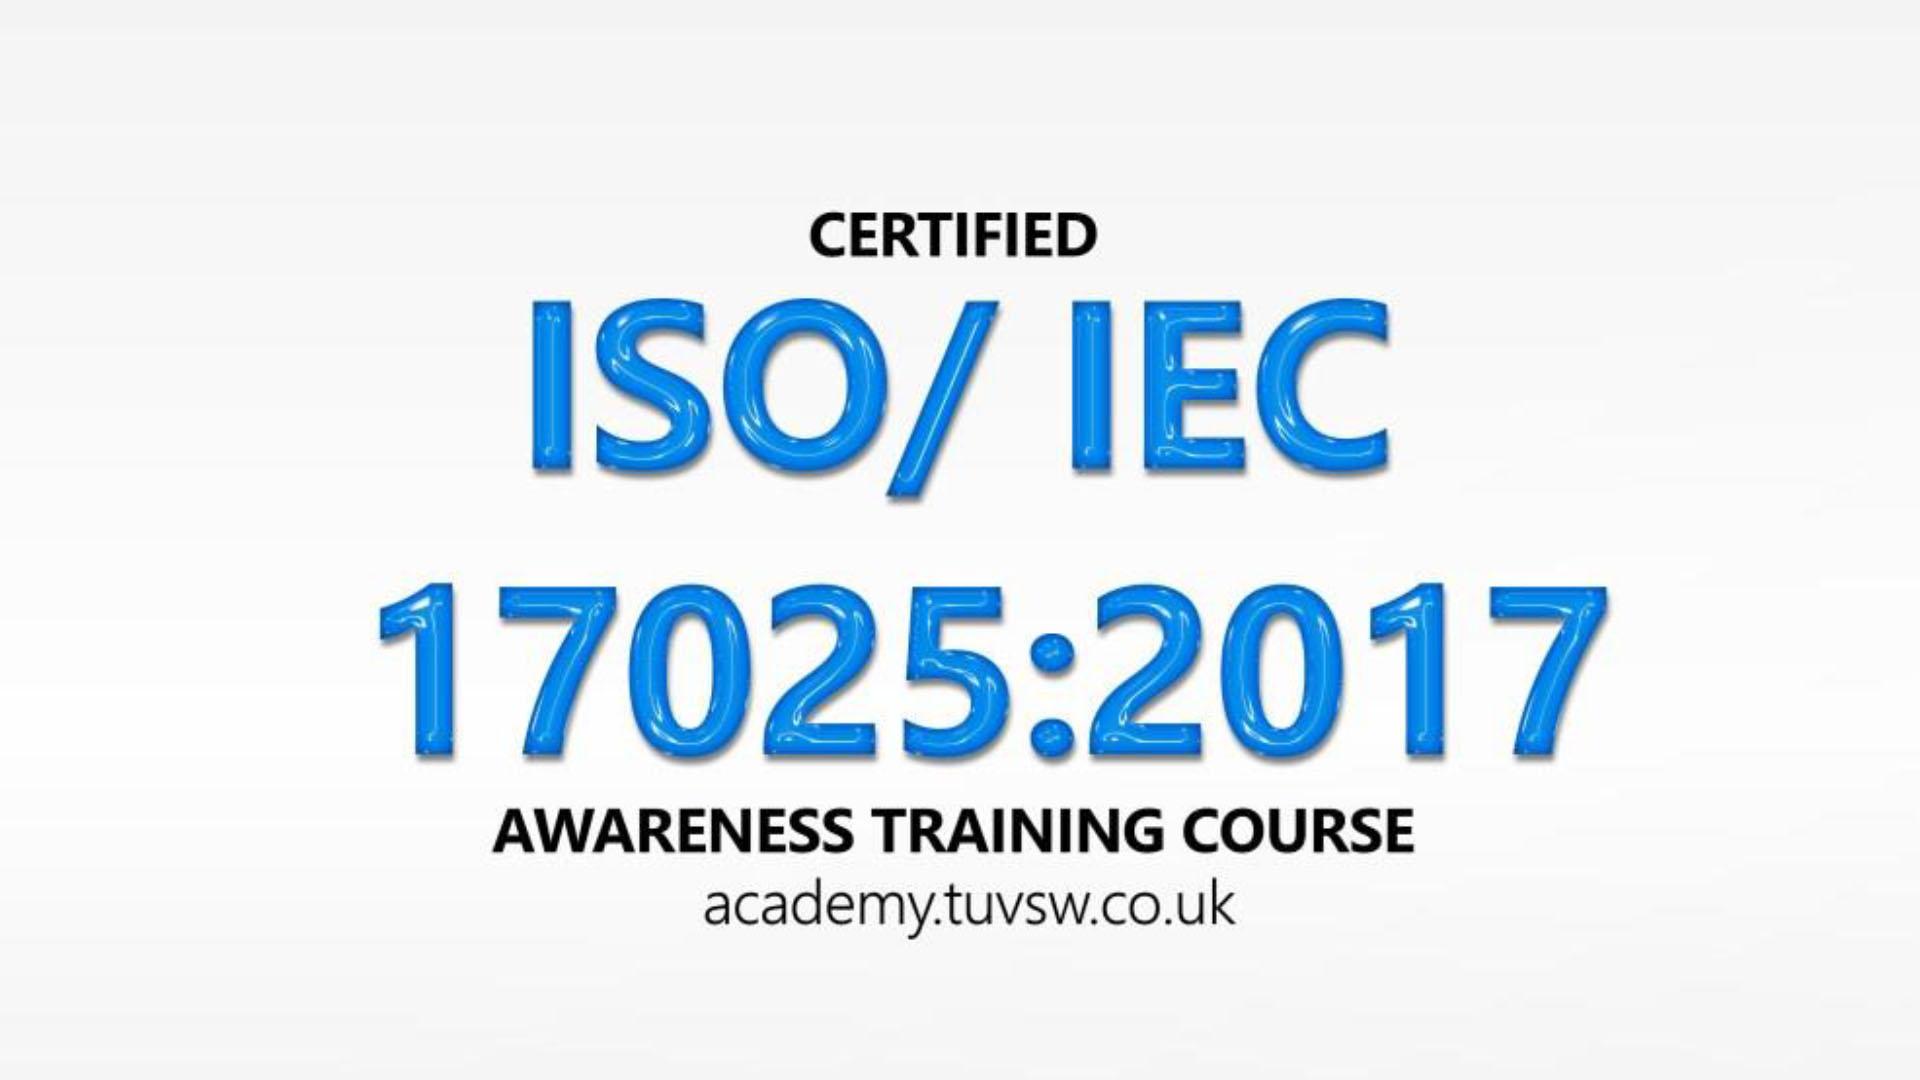 ISO/IEC 17025:2017 Awareness Training Course